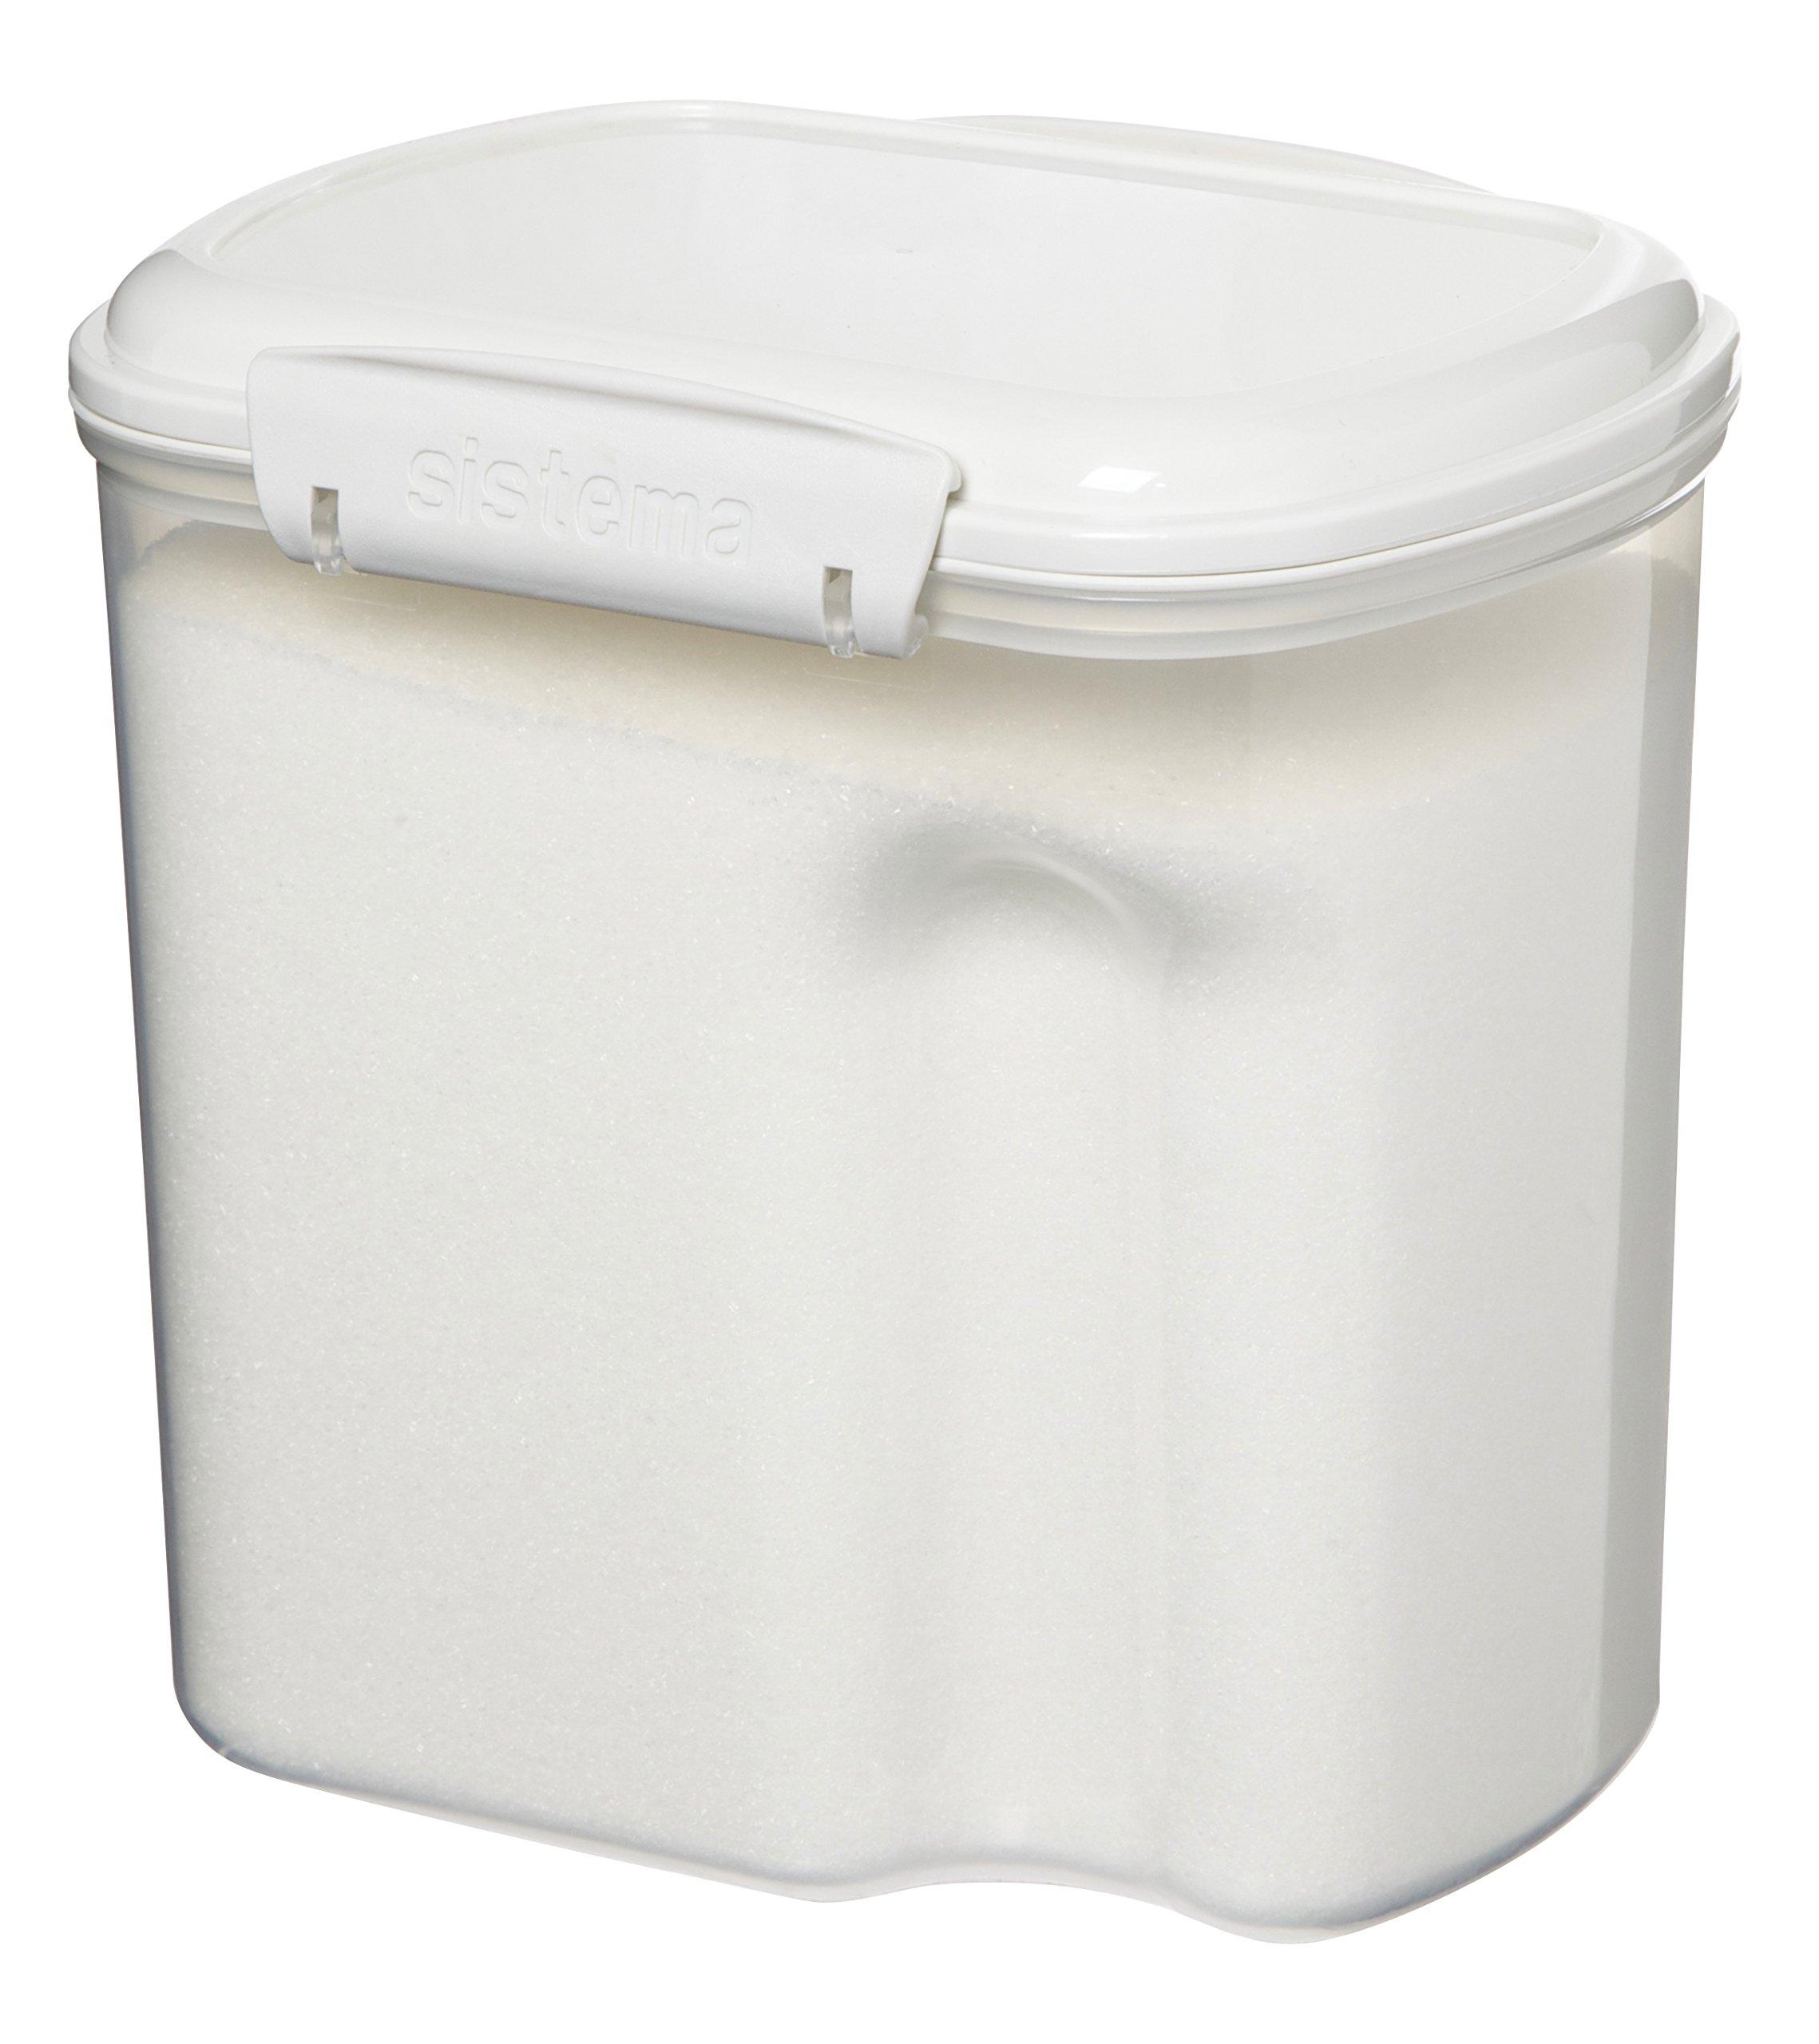 food storage container sugar flour saver set air tight lid kitchen pantry holder 689788772141 ebay. Black Bedroom Furniture Sets. Home Design Ideas